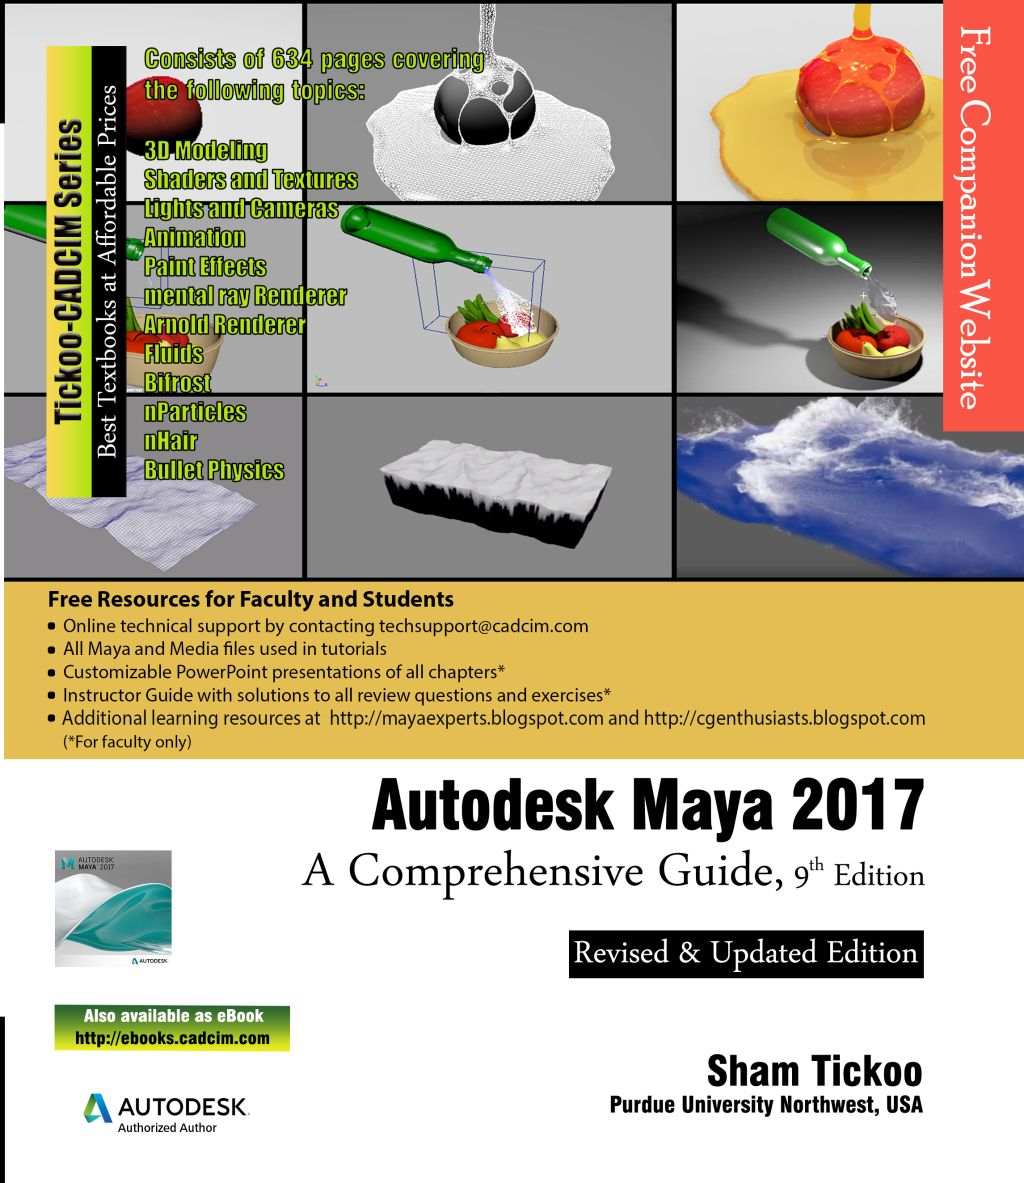 Autodesk Maya 2017 A Comprehensive Guide 9th Edition Ebook